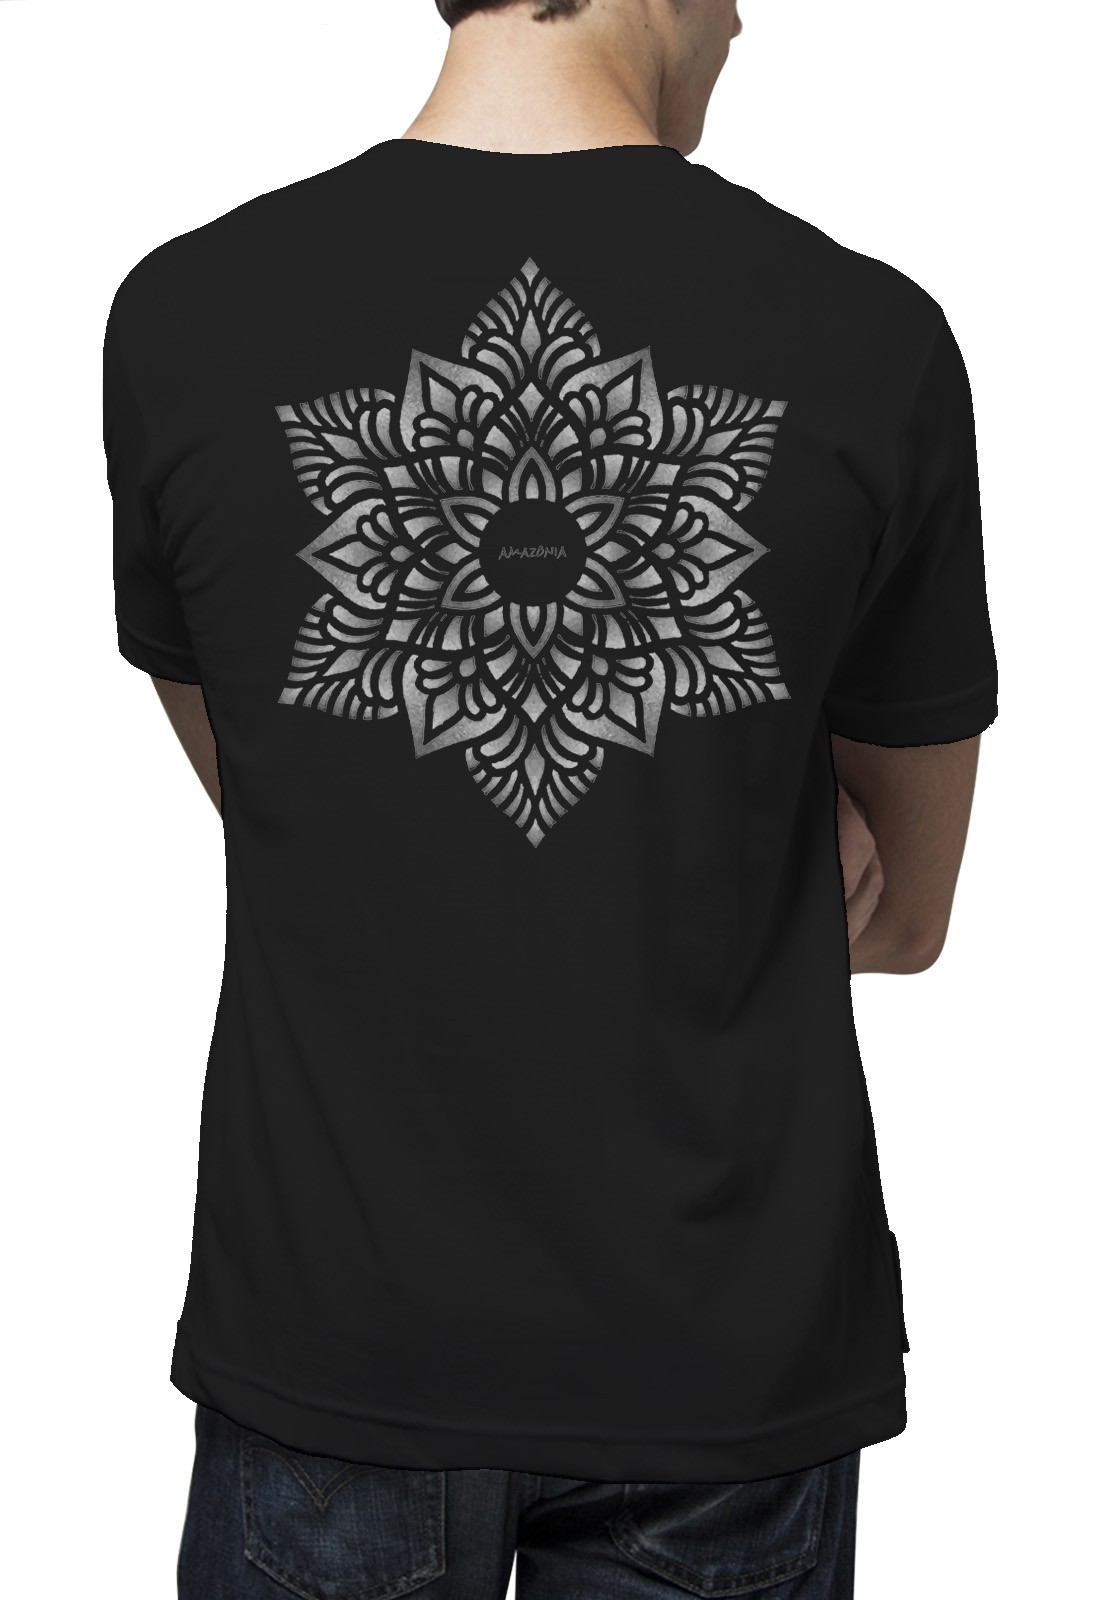 Camiseta Amazônia Flower - Preto